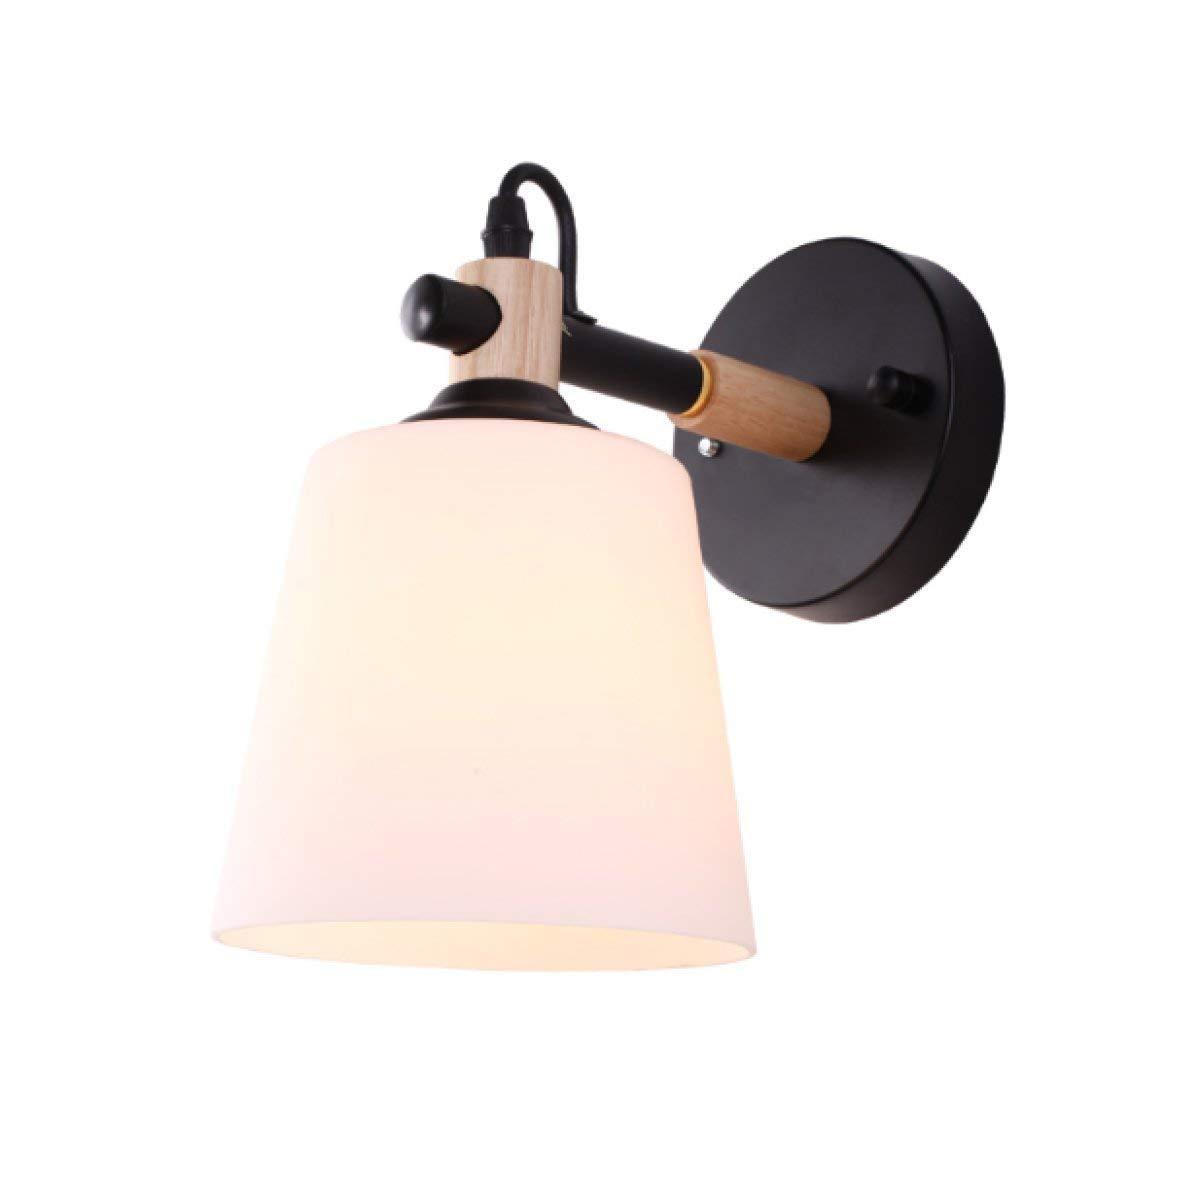 A HUAIX Home Moderne minimalistische Wandleuchte Nachttischlampe Gang Korridor Schlafzimmer Wandleuchte Glas Lampe Holz Wandleuchte (Farbe   A)